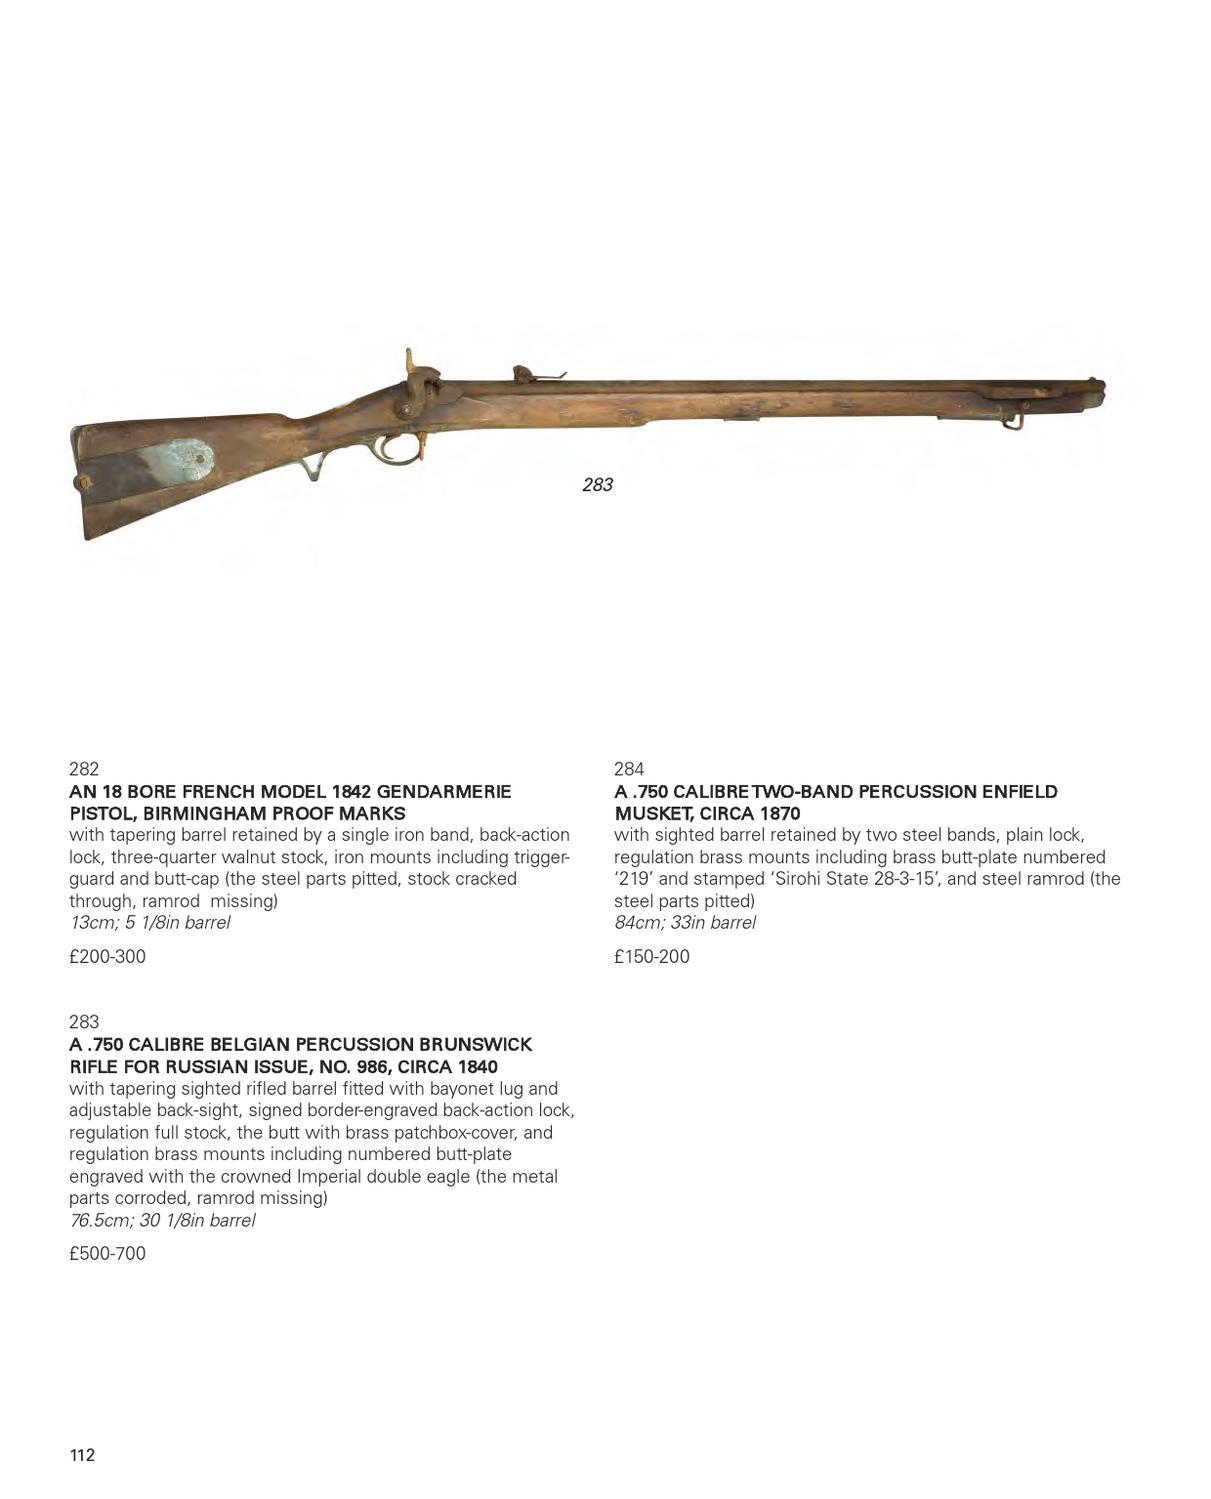 Thomas Del Mar - Dec 5th 2012 - Antique Arms, Armour